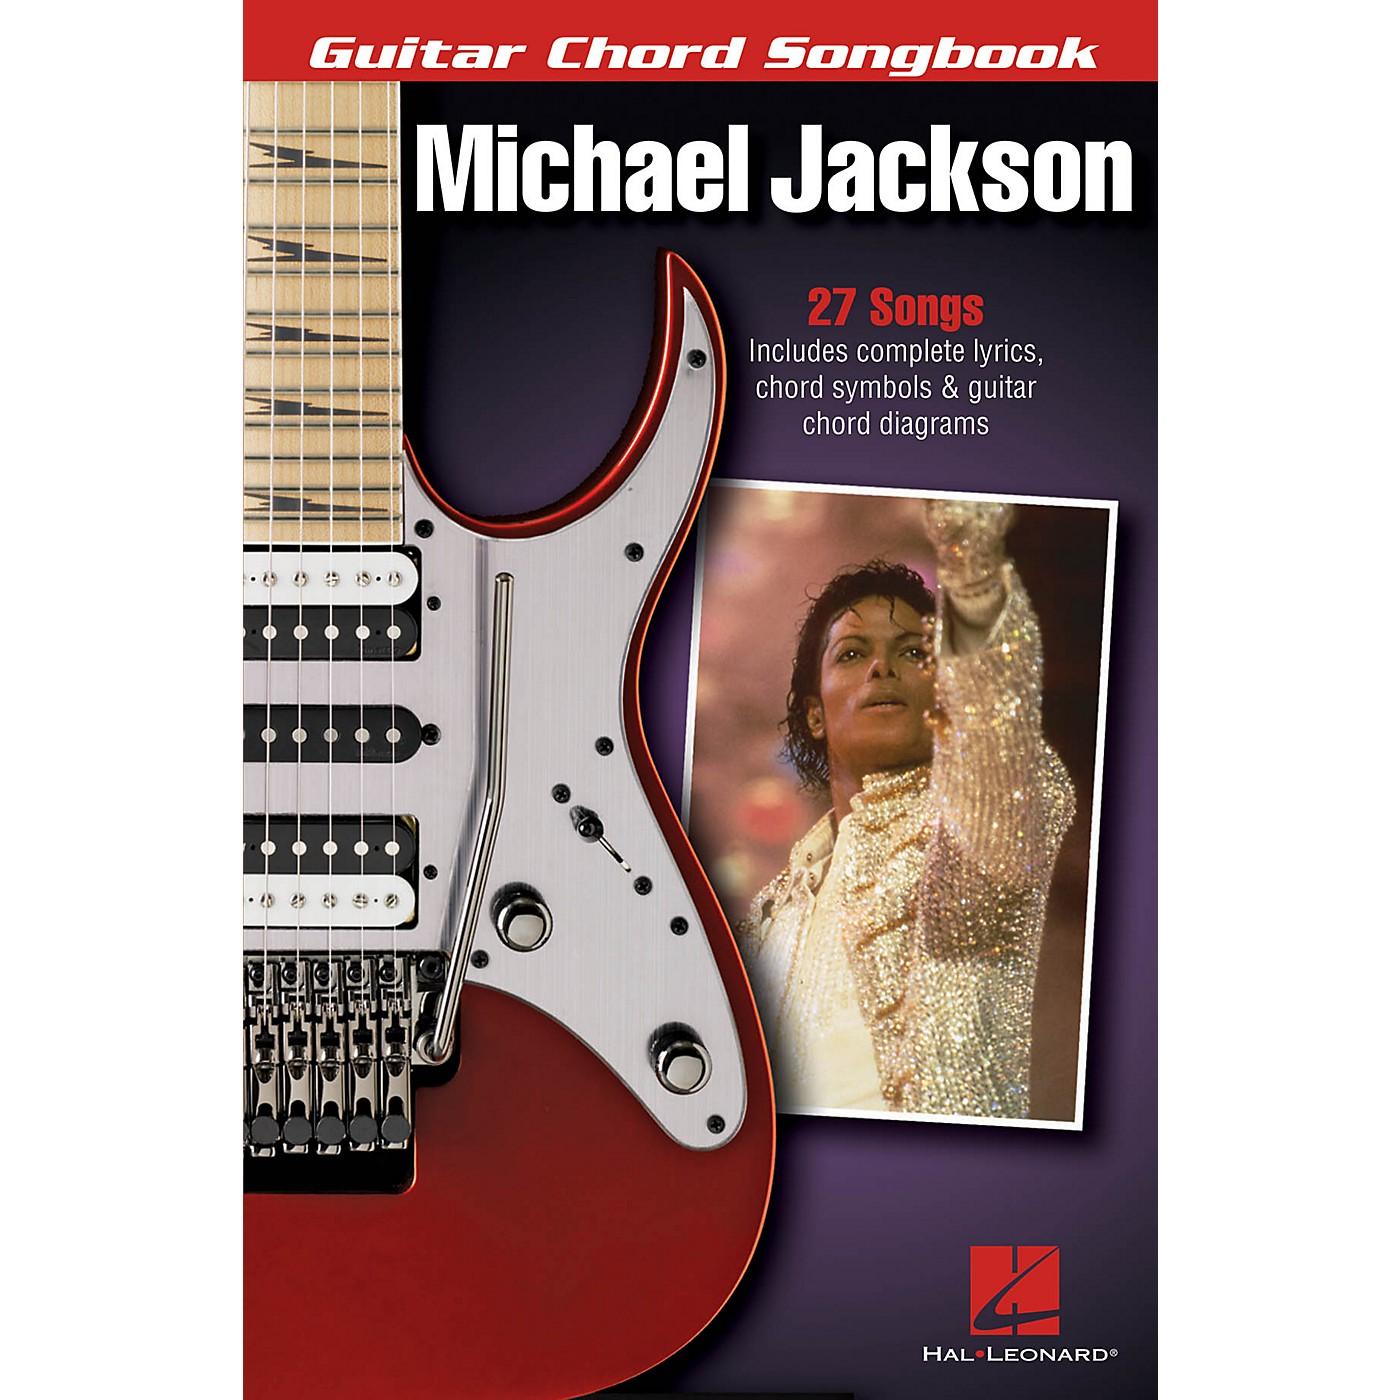 Hal Leonard Michael Jackson - Guitar Chord Songbook Guitar Chord Songbook Series Softcover by Michael Jackson thumbnail